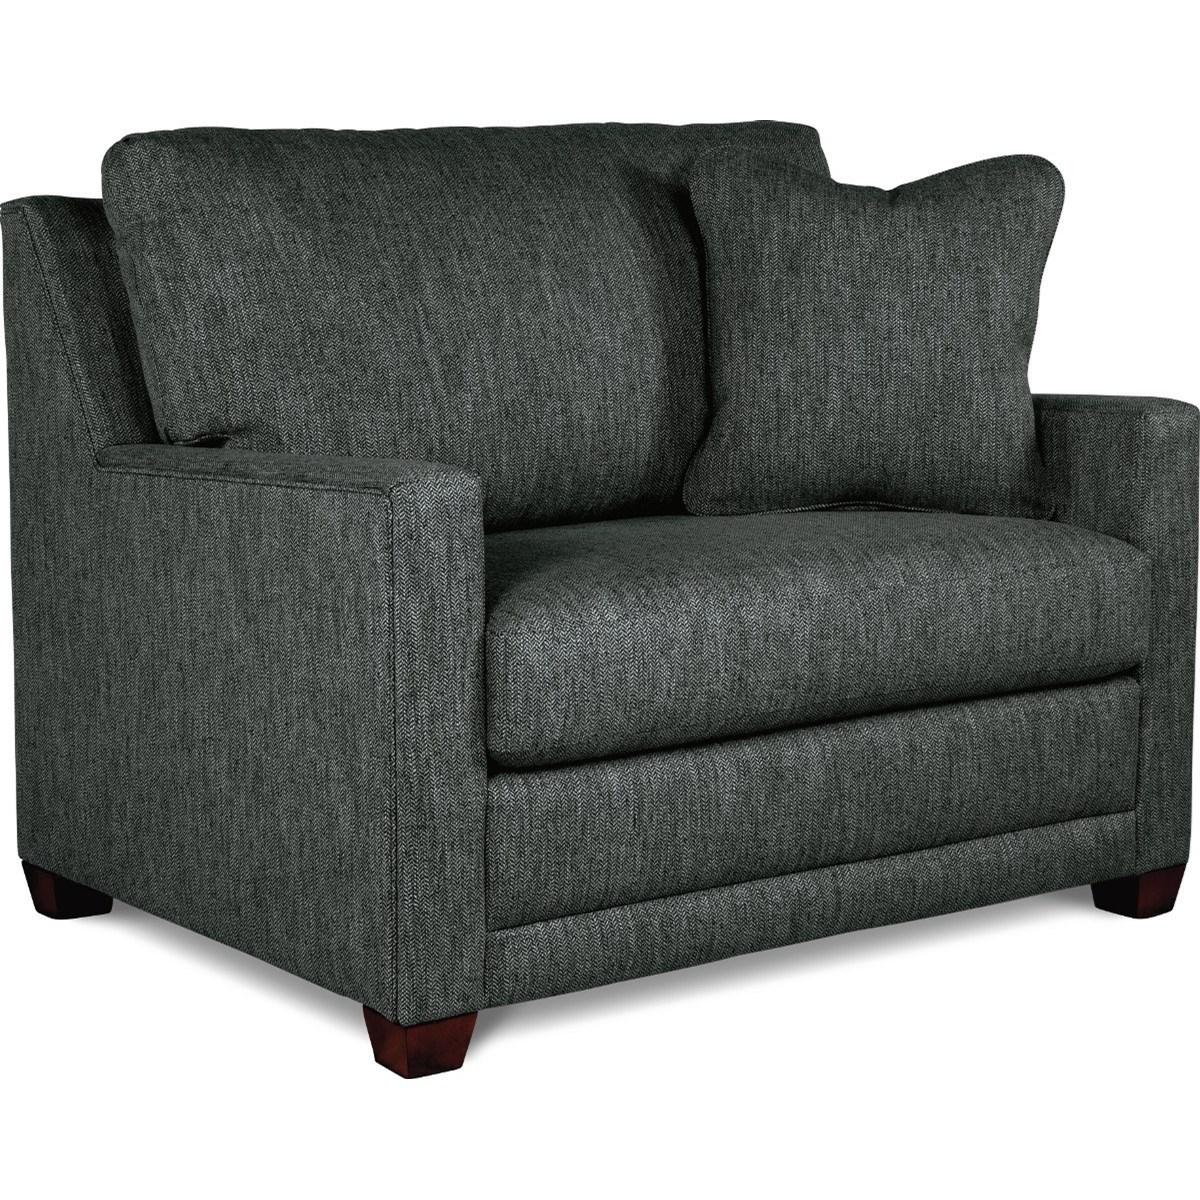 La Z Boy Twilight Contemporary Twin Sofa Sleeper | Conlin Within Twin Sofa Chairs (View 7 of 15)